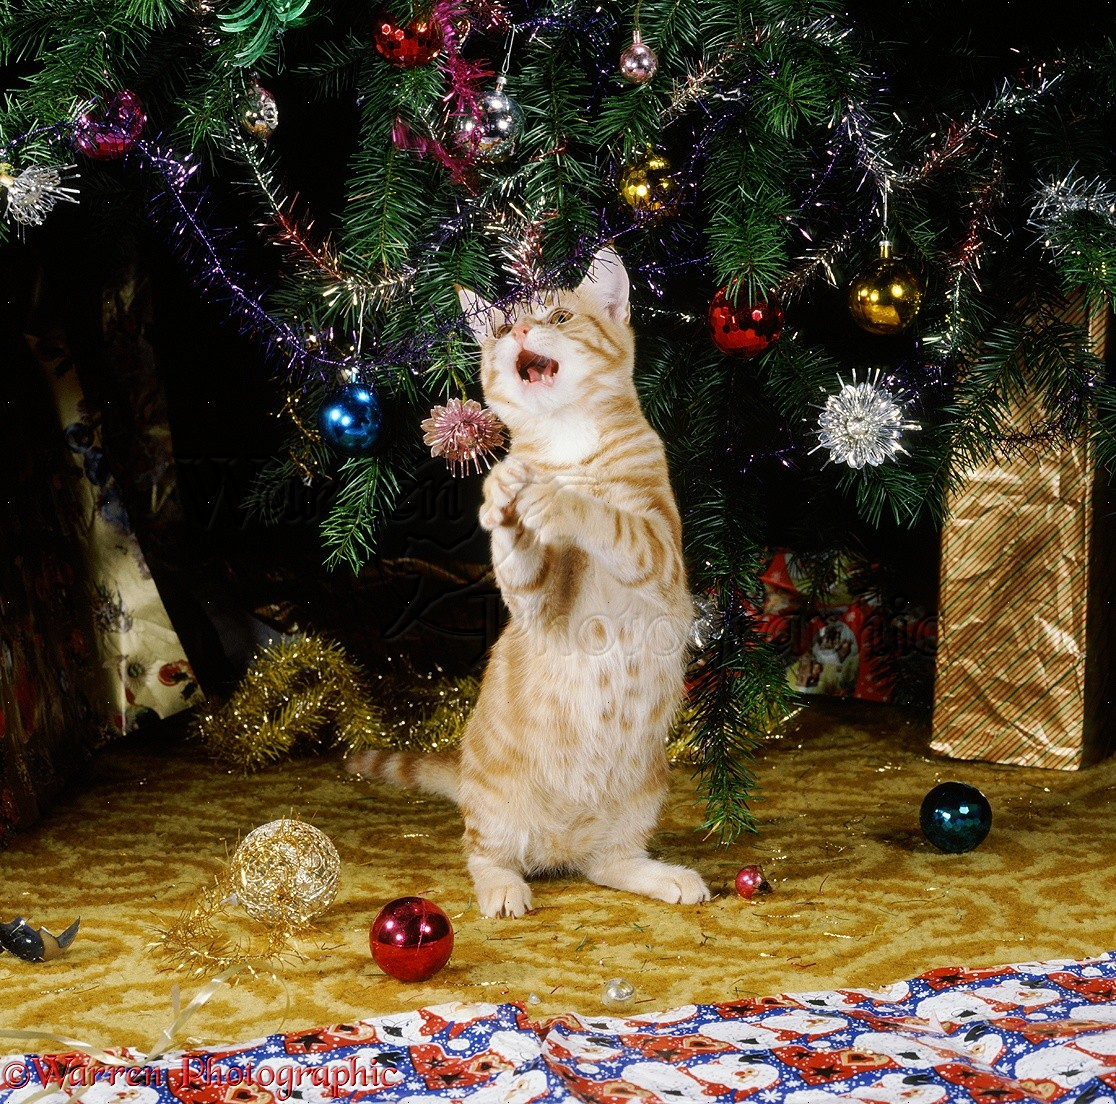 Laguna Hills Animal Hospital: Keepin\' Kitties Out Of The Christmas Tree!